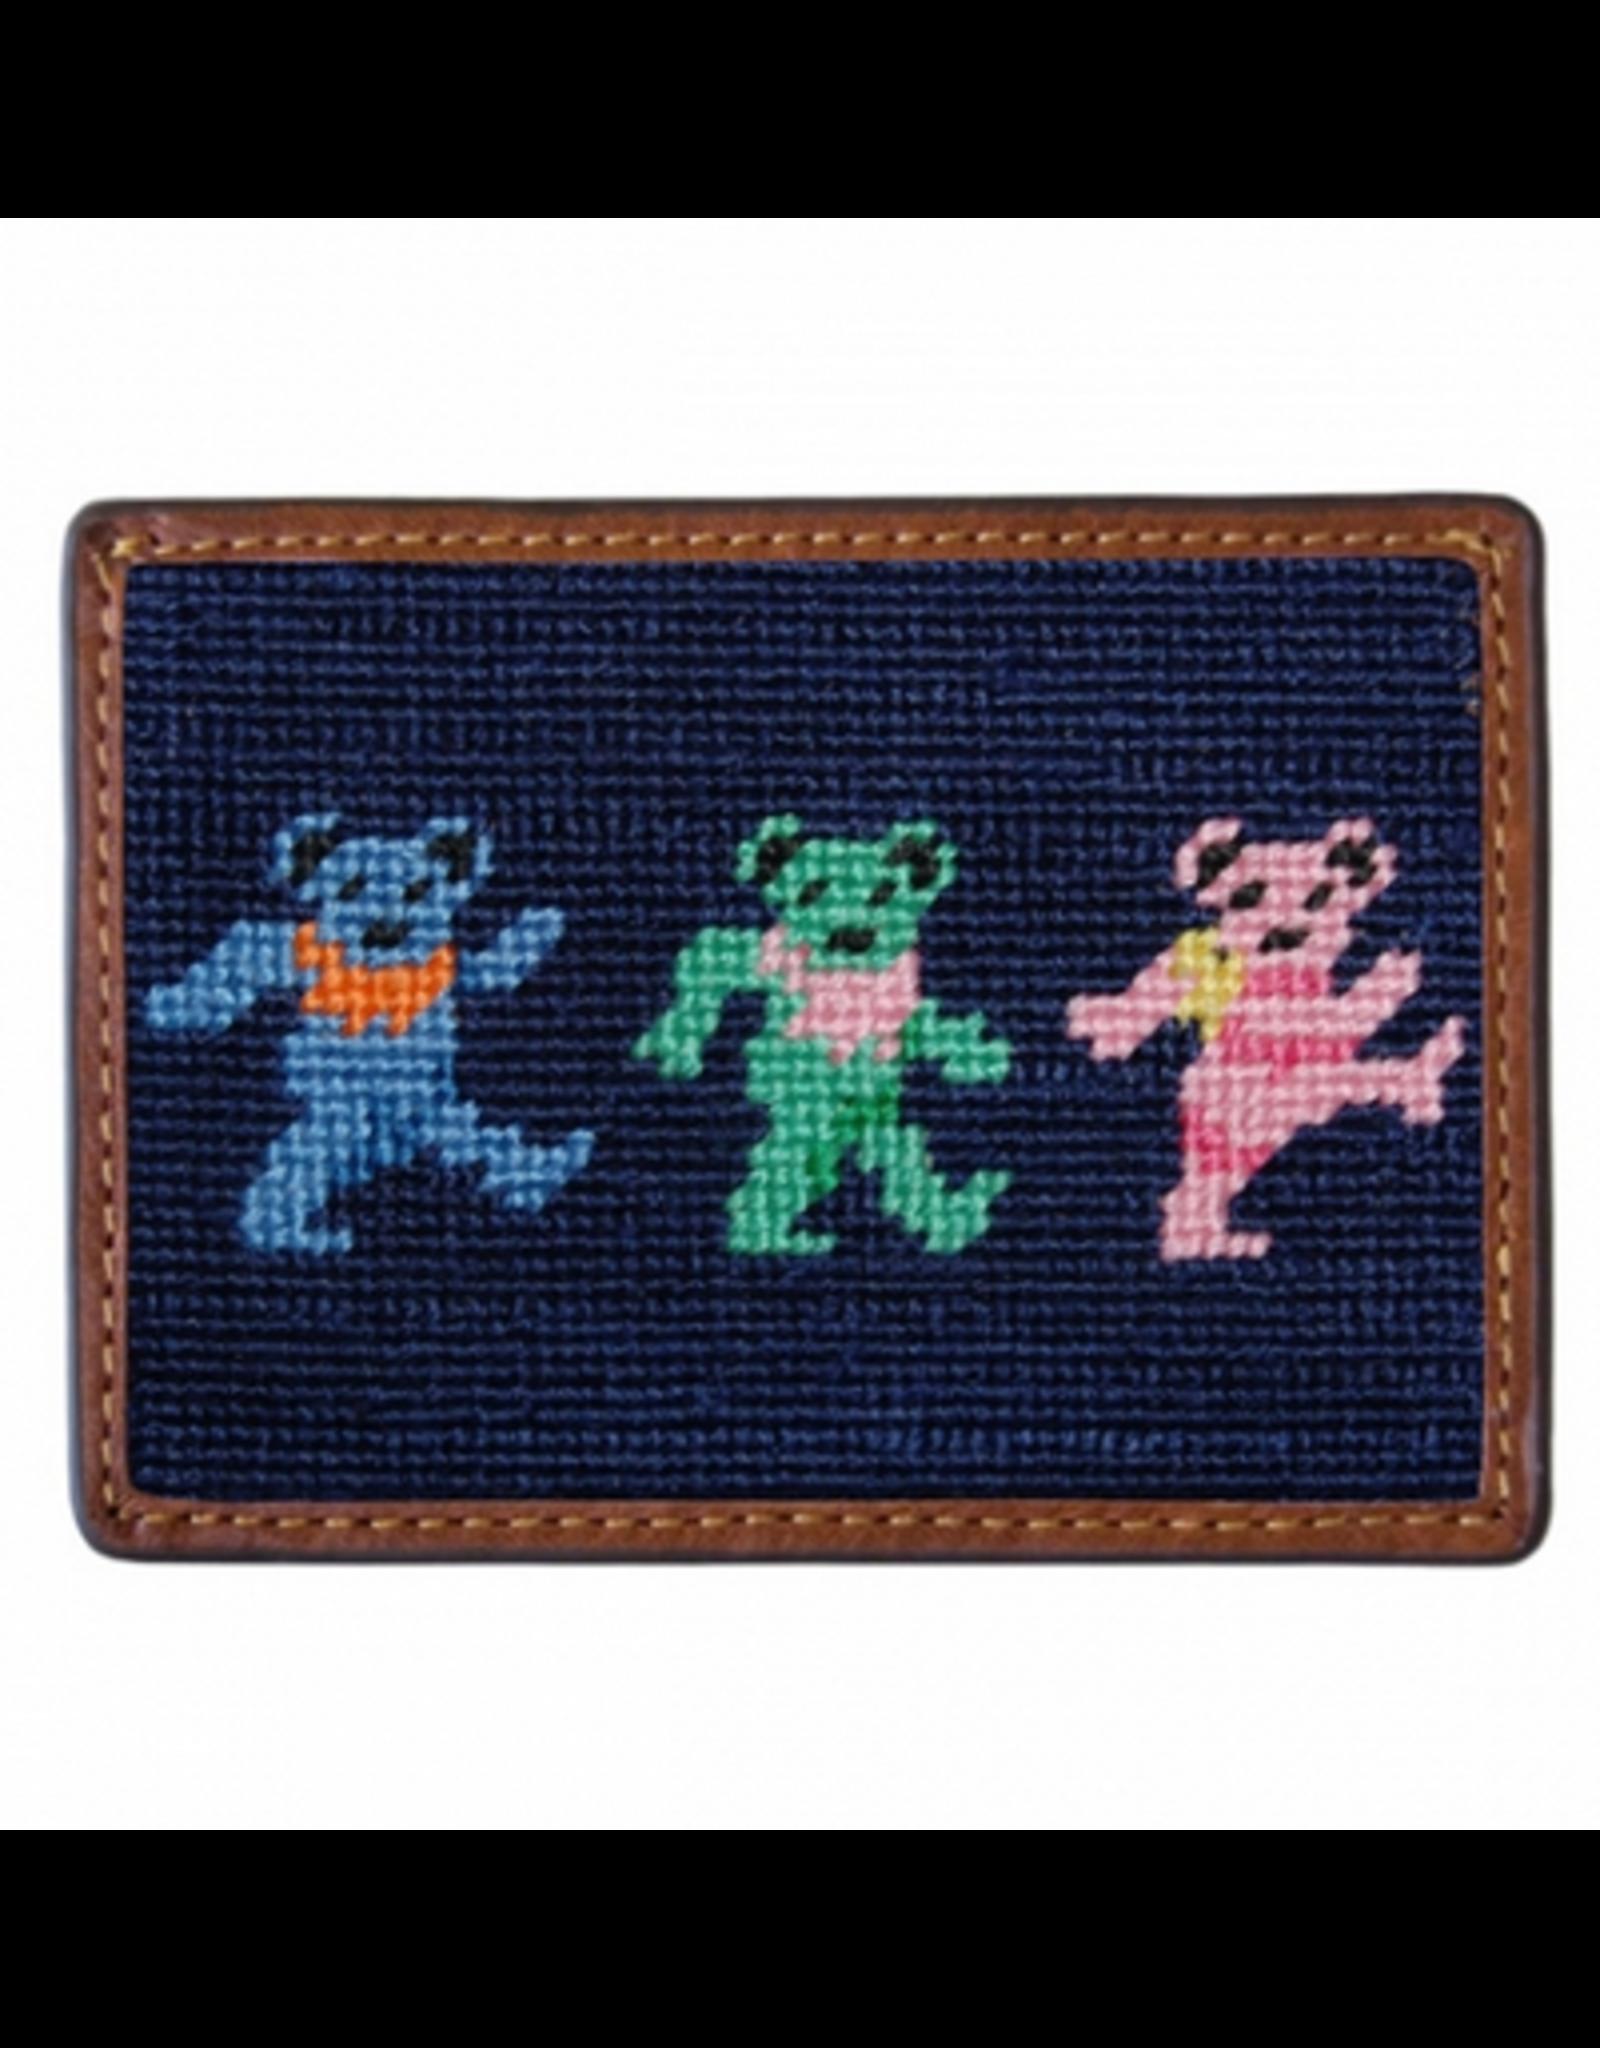 Smathers & Branson S&B Needlepoint Card Wallet, Dancing Bears